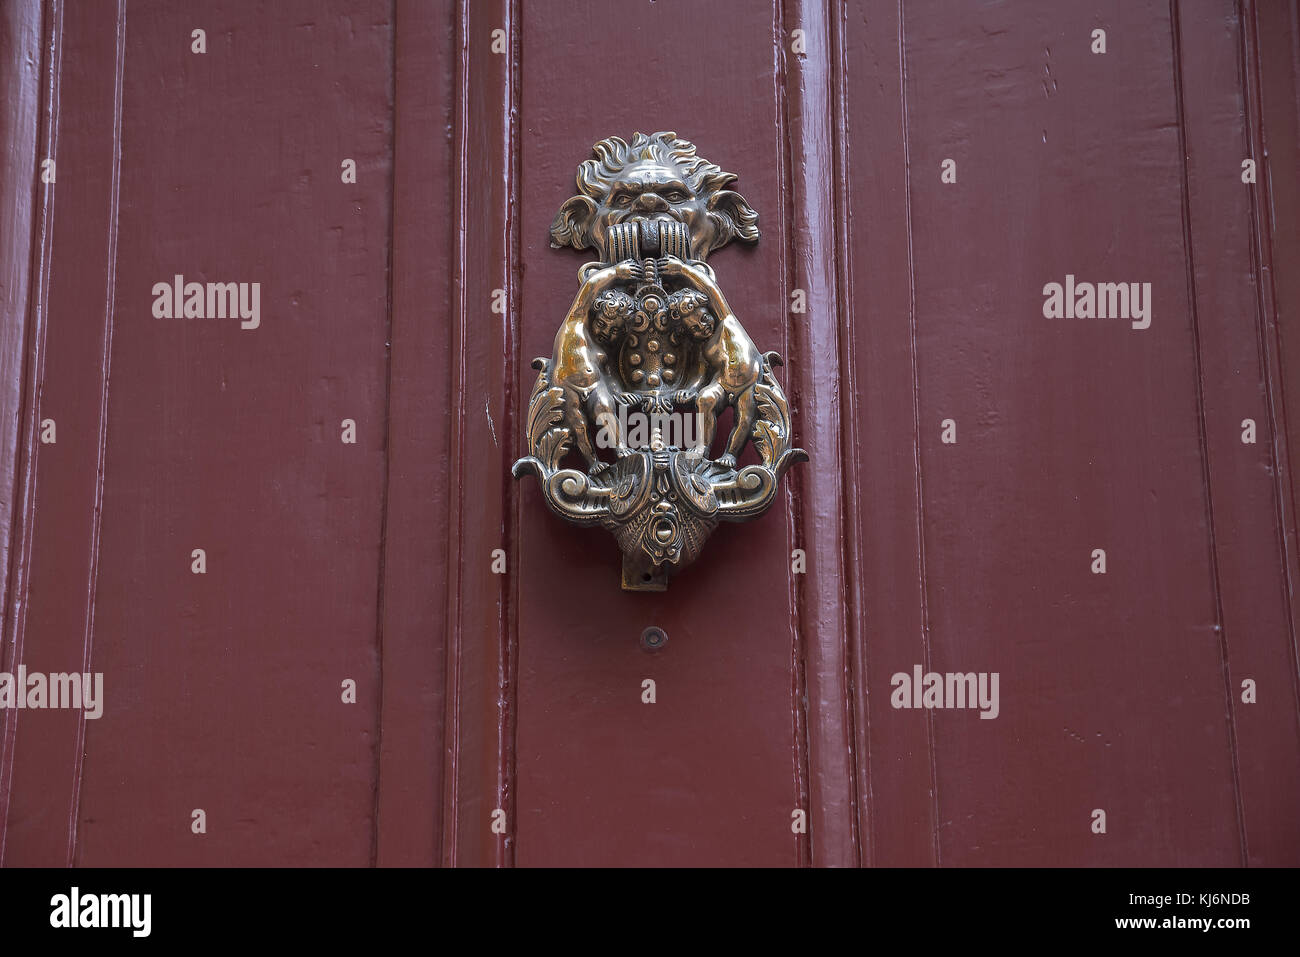 Antique door knob of ancient house, Philadelphia, Pennsylvania, USA, Philadelphia, Pennsylvania, USA - Stock Image